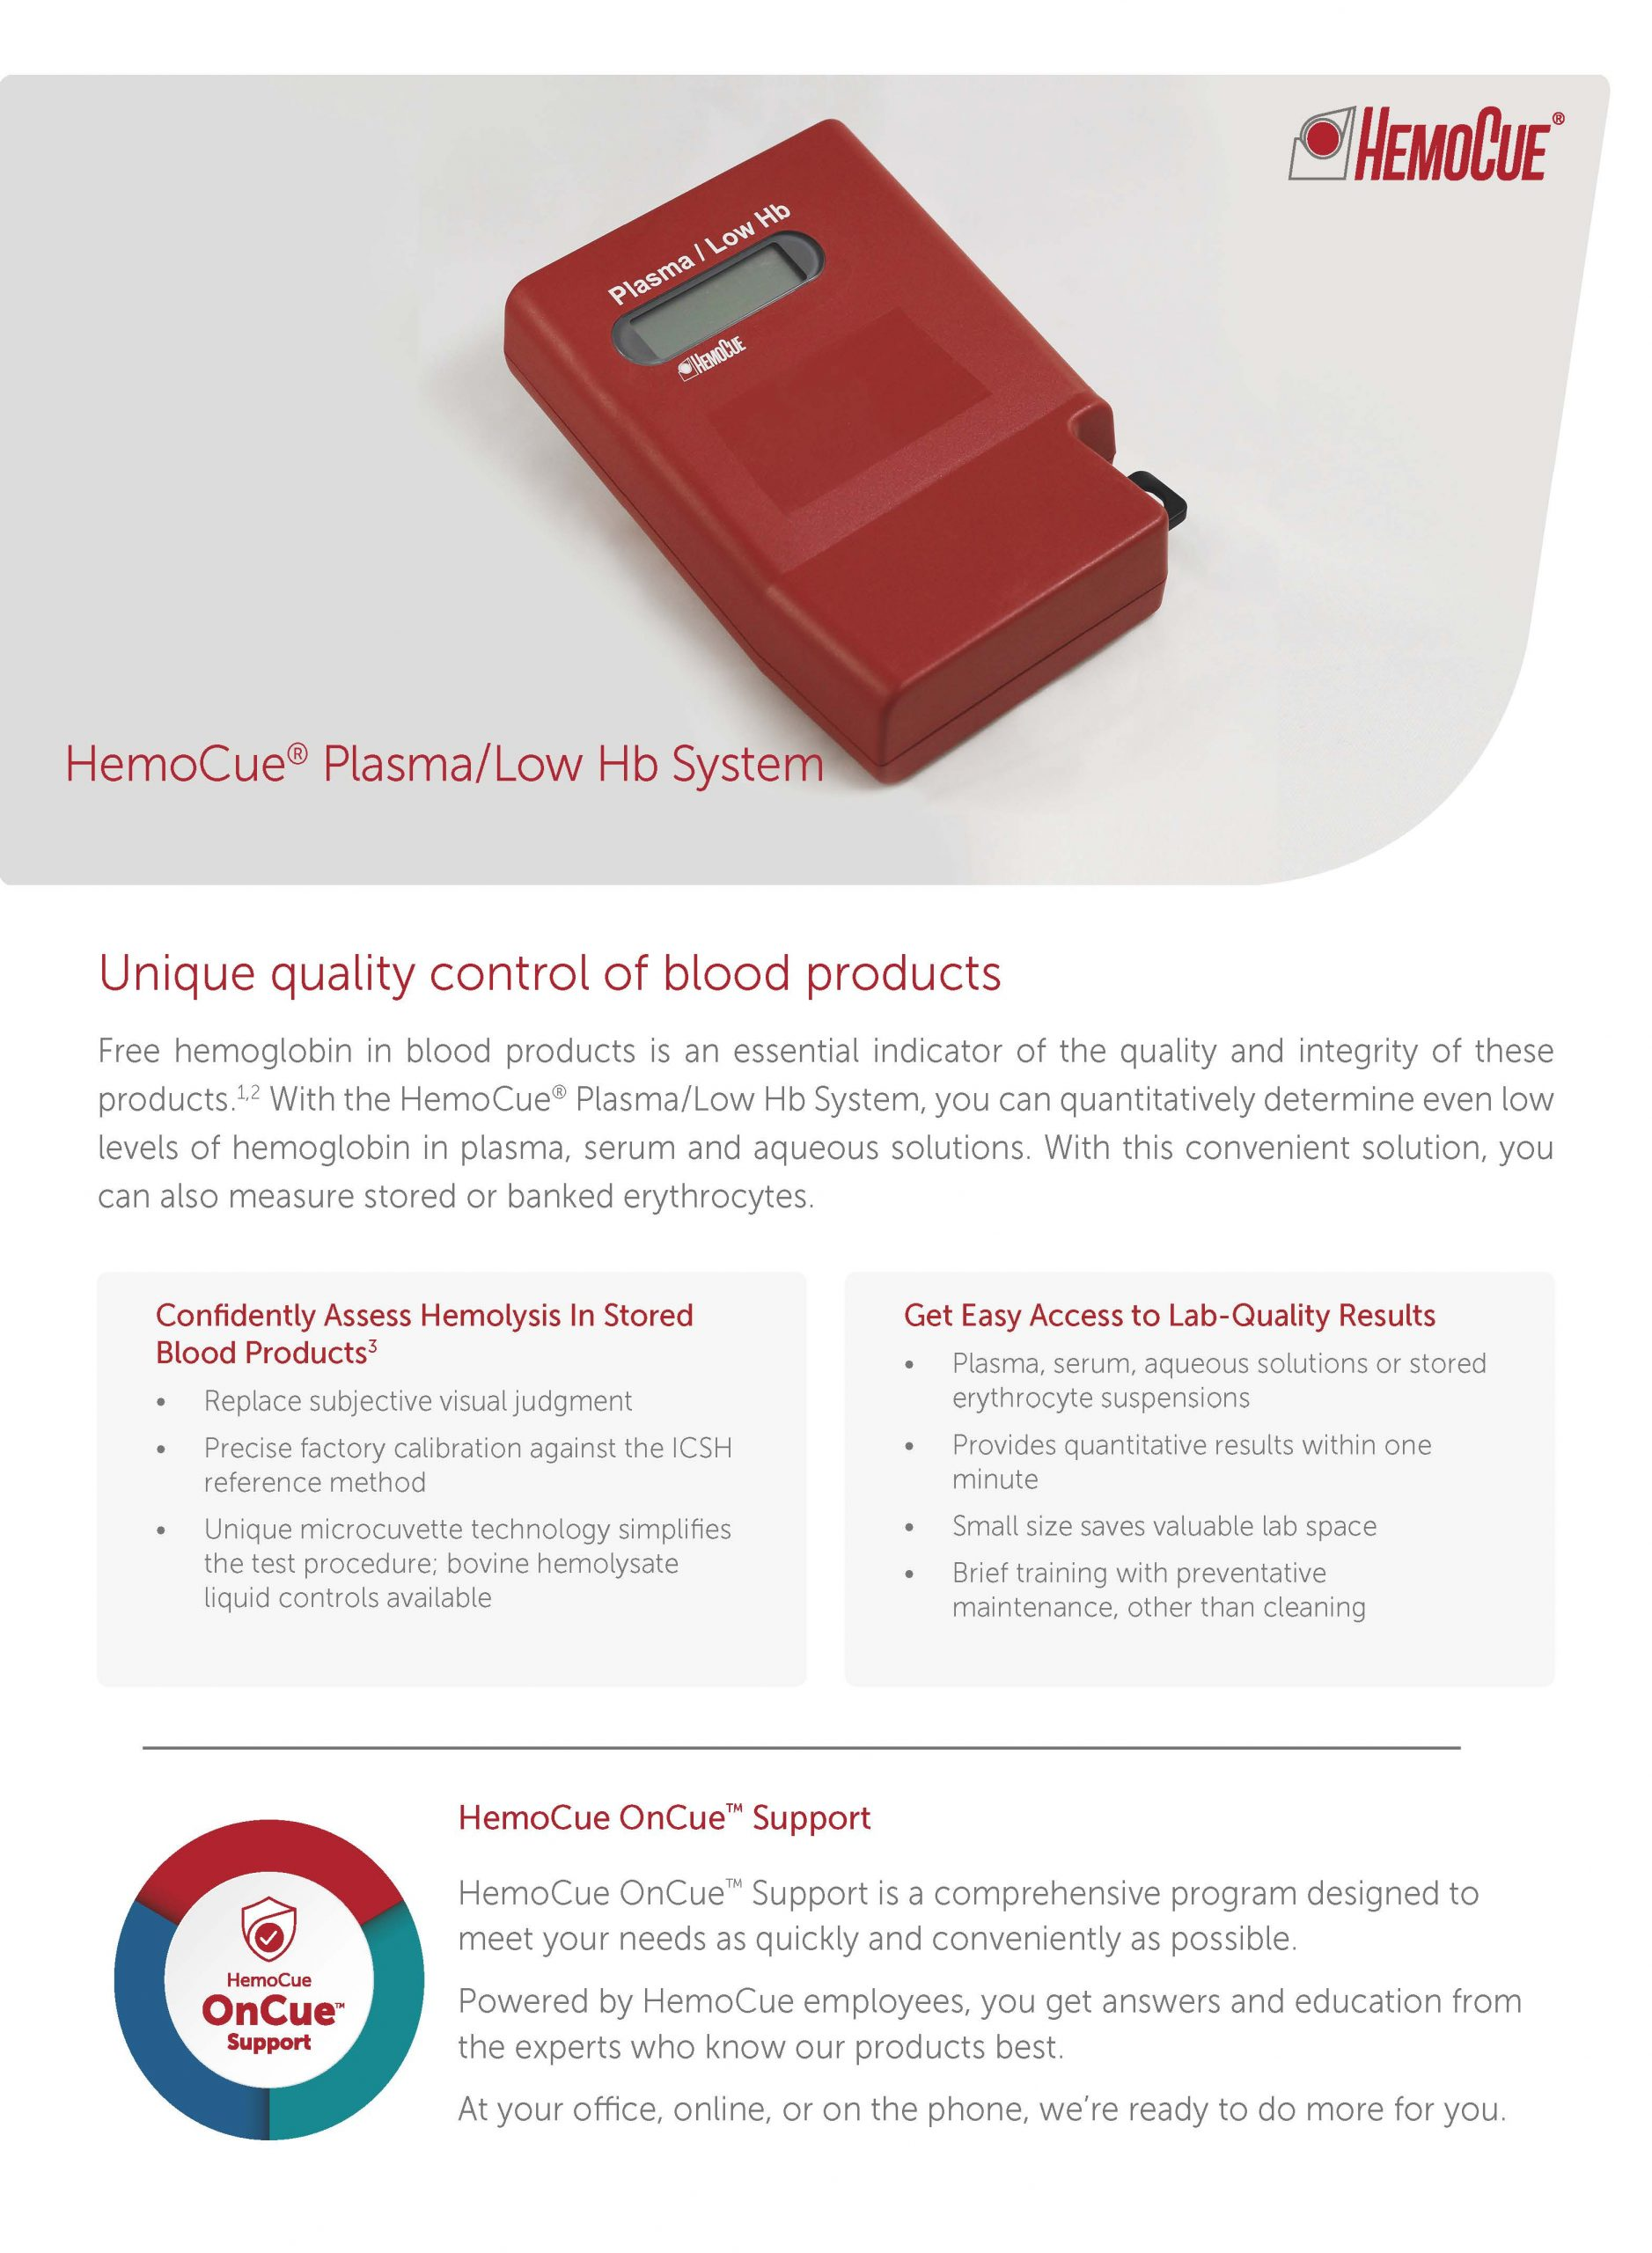 HemoCue Plasma/Low Hb Product Brochure